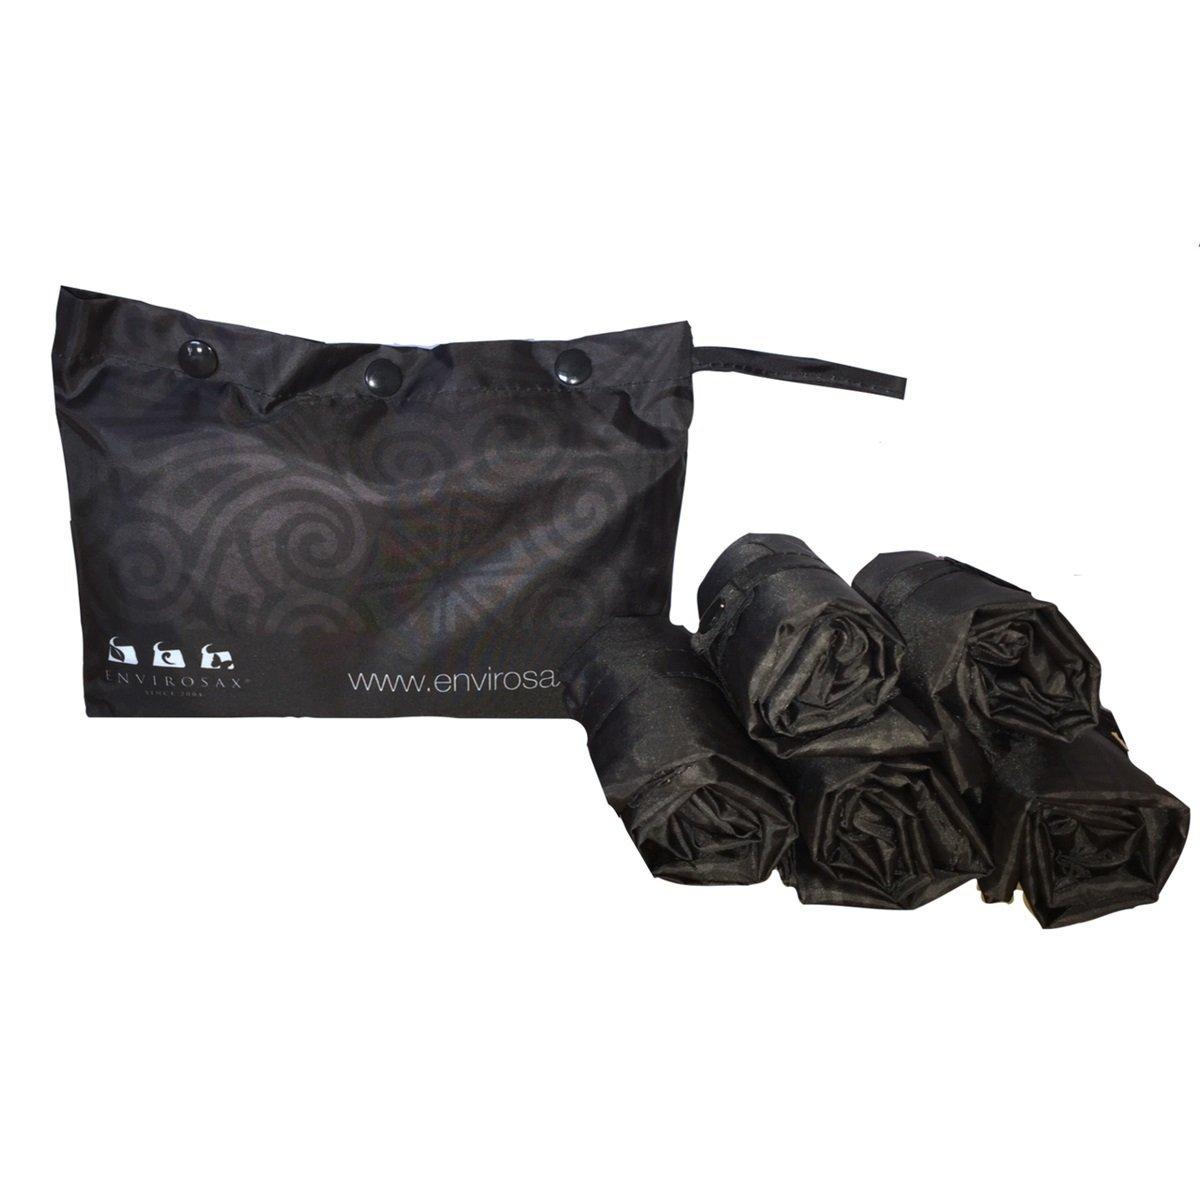 Envirosax DD。p5 Duskyダマスクポーチreusable-grocery-bags、ブラック B0742RDLZQ